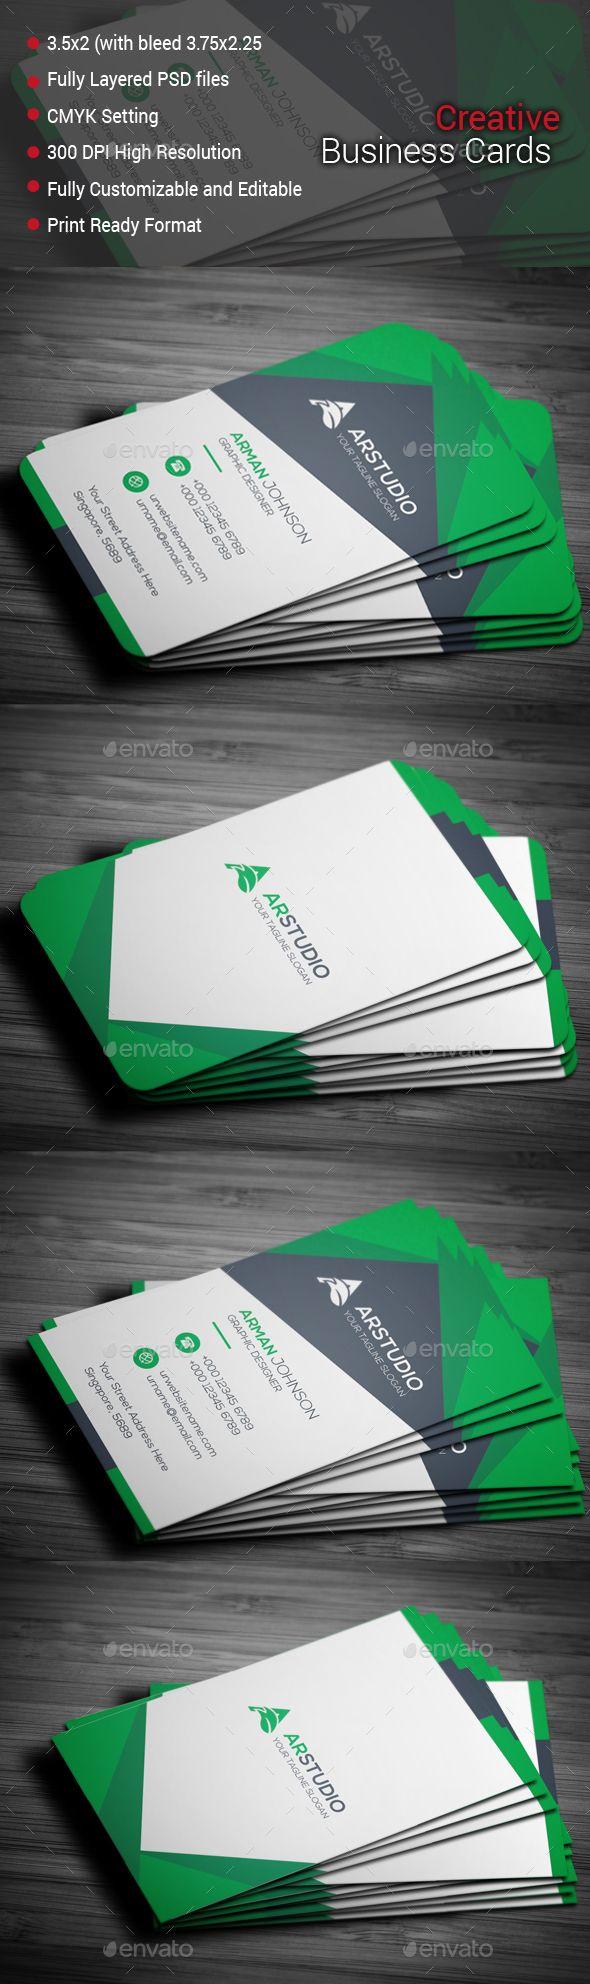 Creative Business Card Template PSD #design Download: http://graphicriver.net/item/creative-business-card/14059091?ref=ksioks